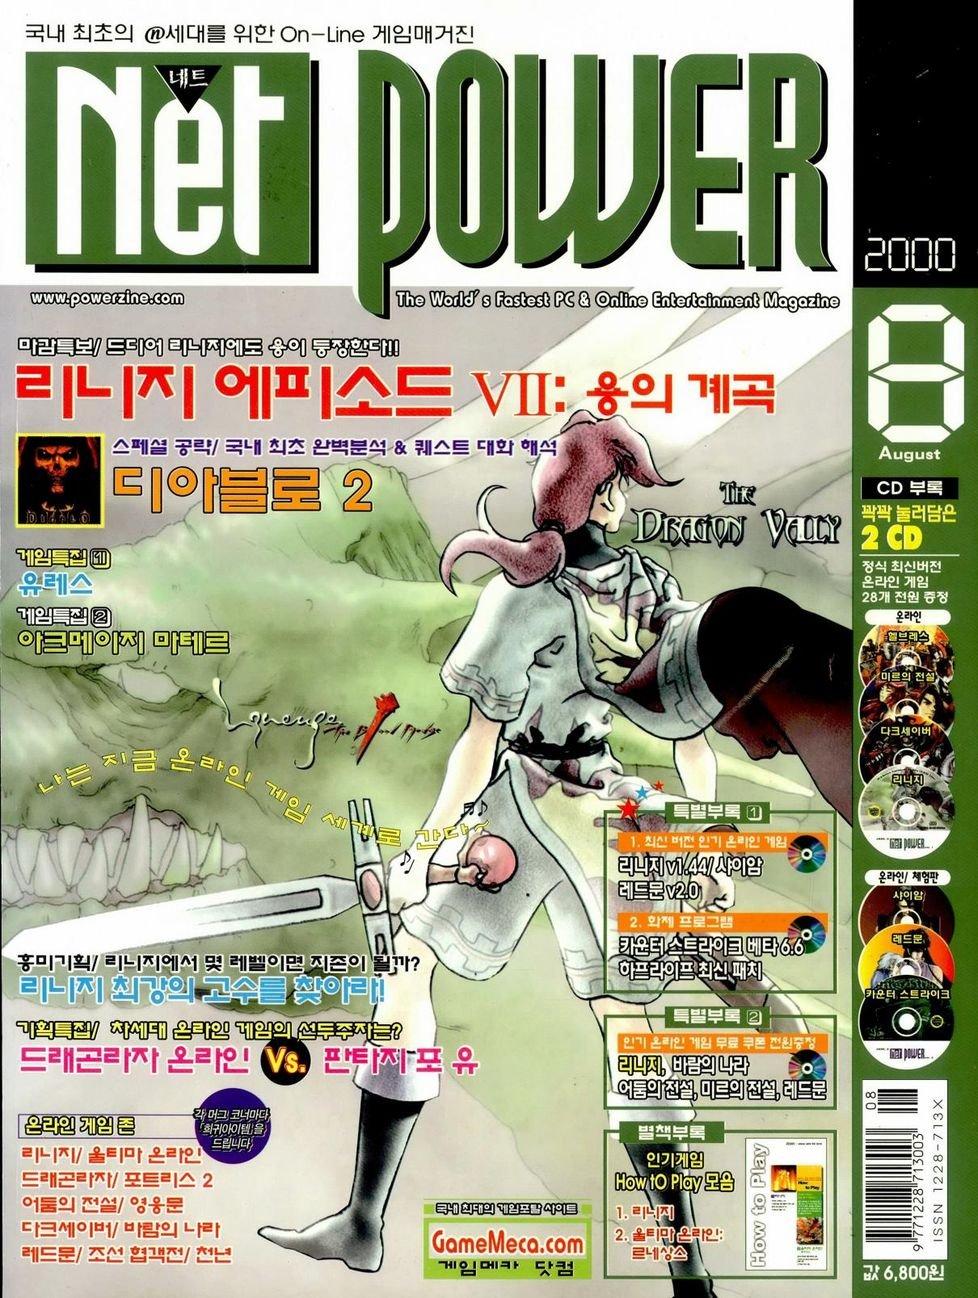 Net Power Issue 11 (August 2000)